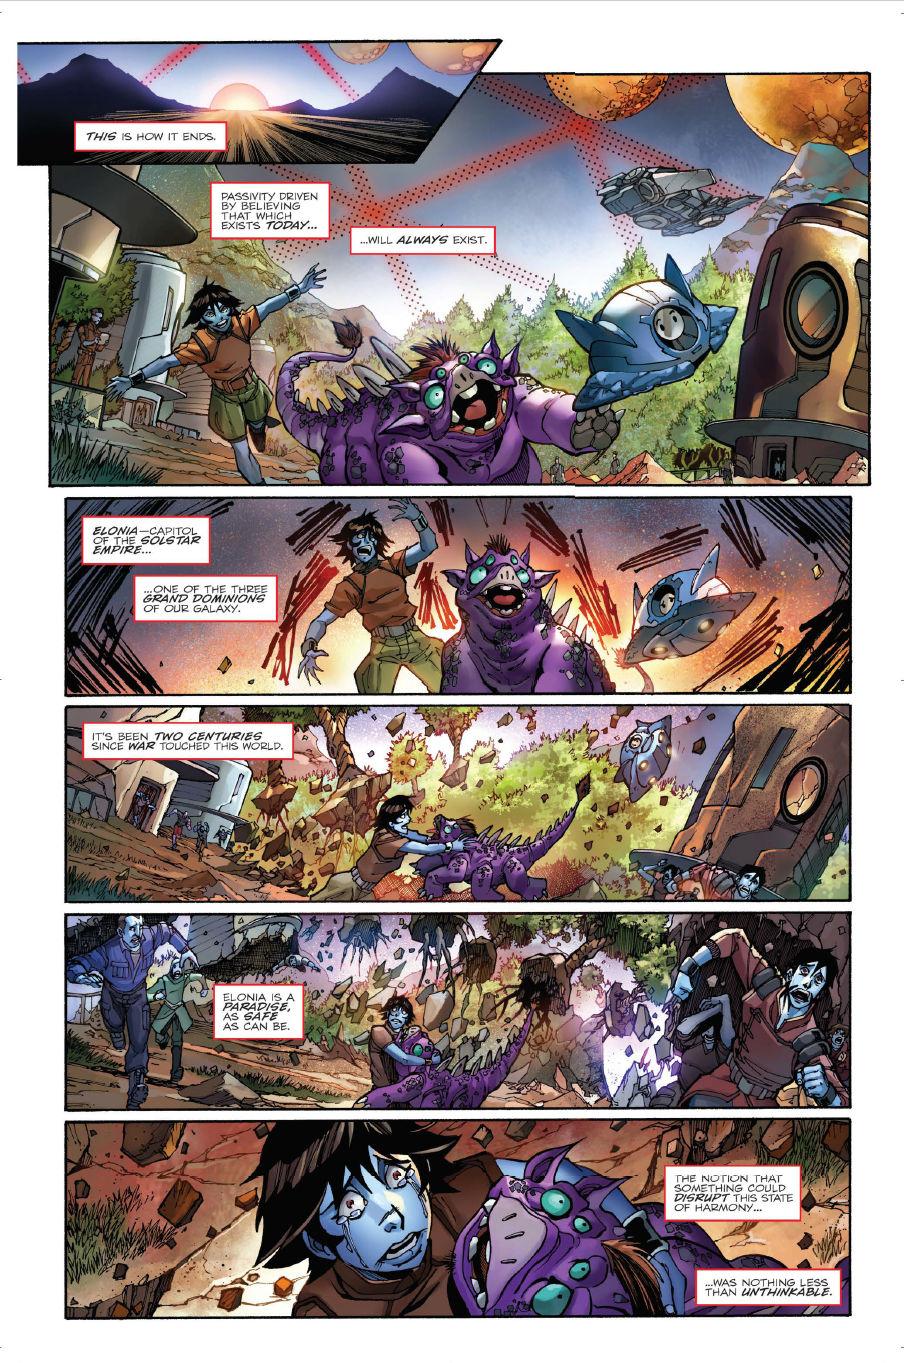 FCBD 2018 Transformers: Unicron #0 - Preview 1.